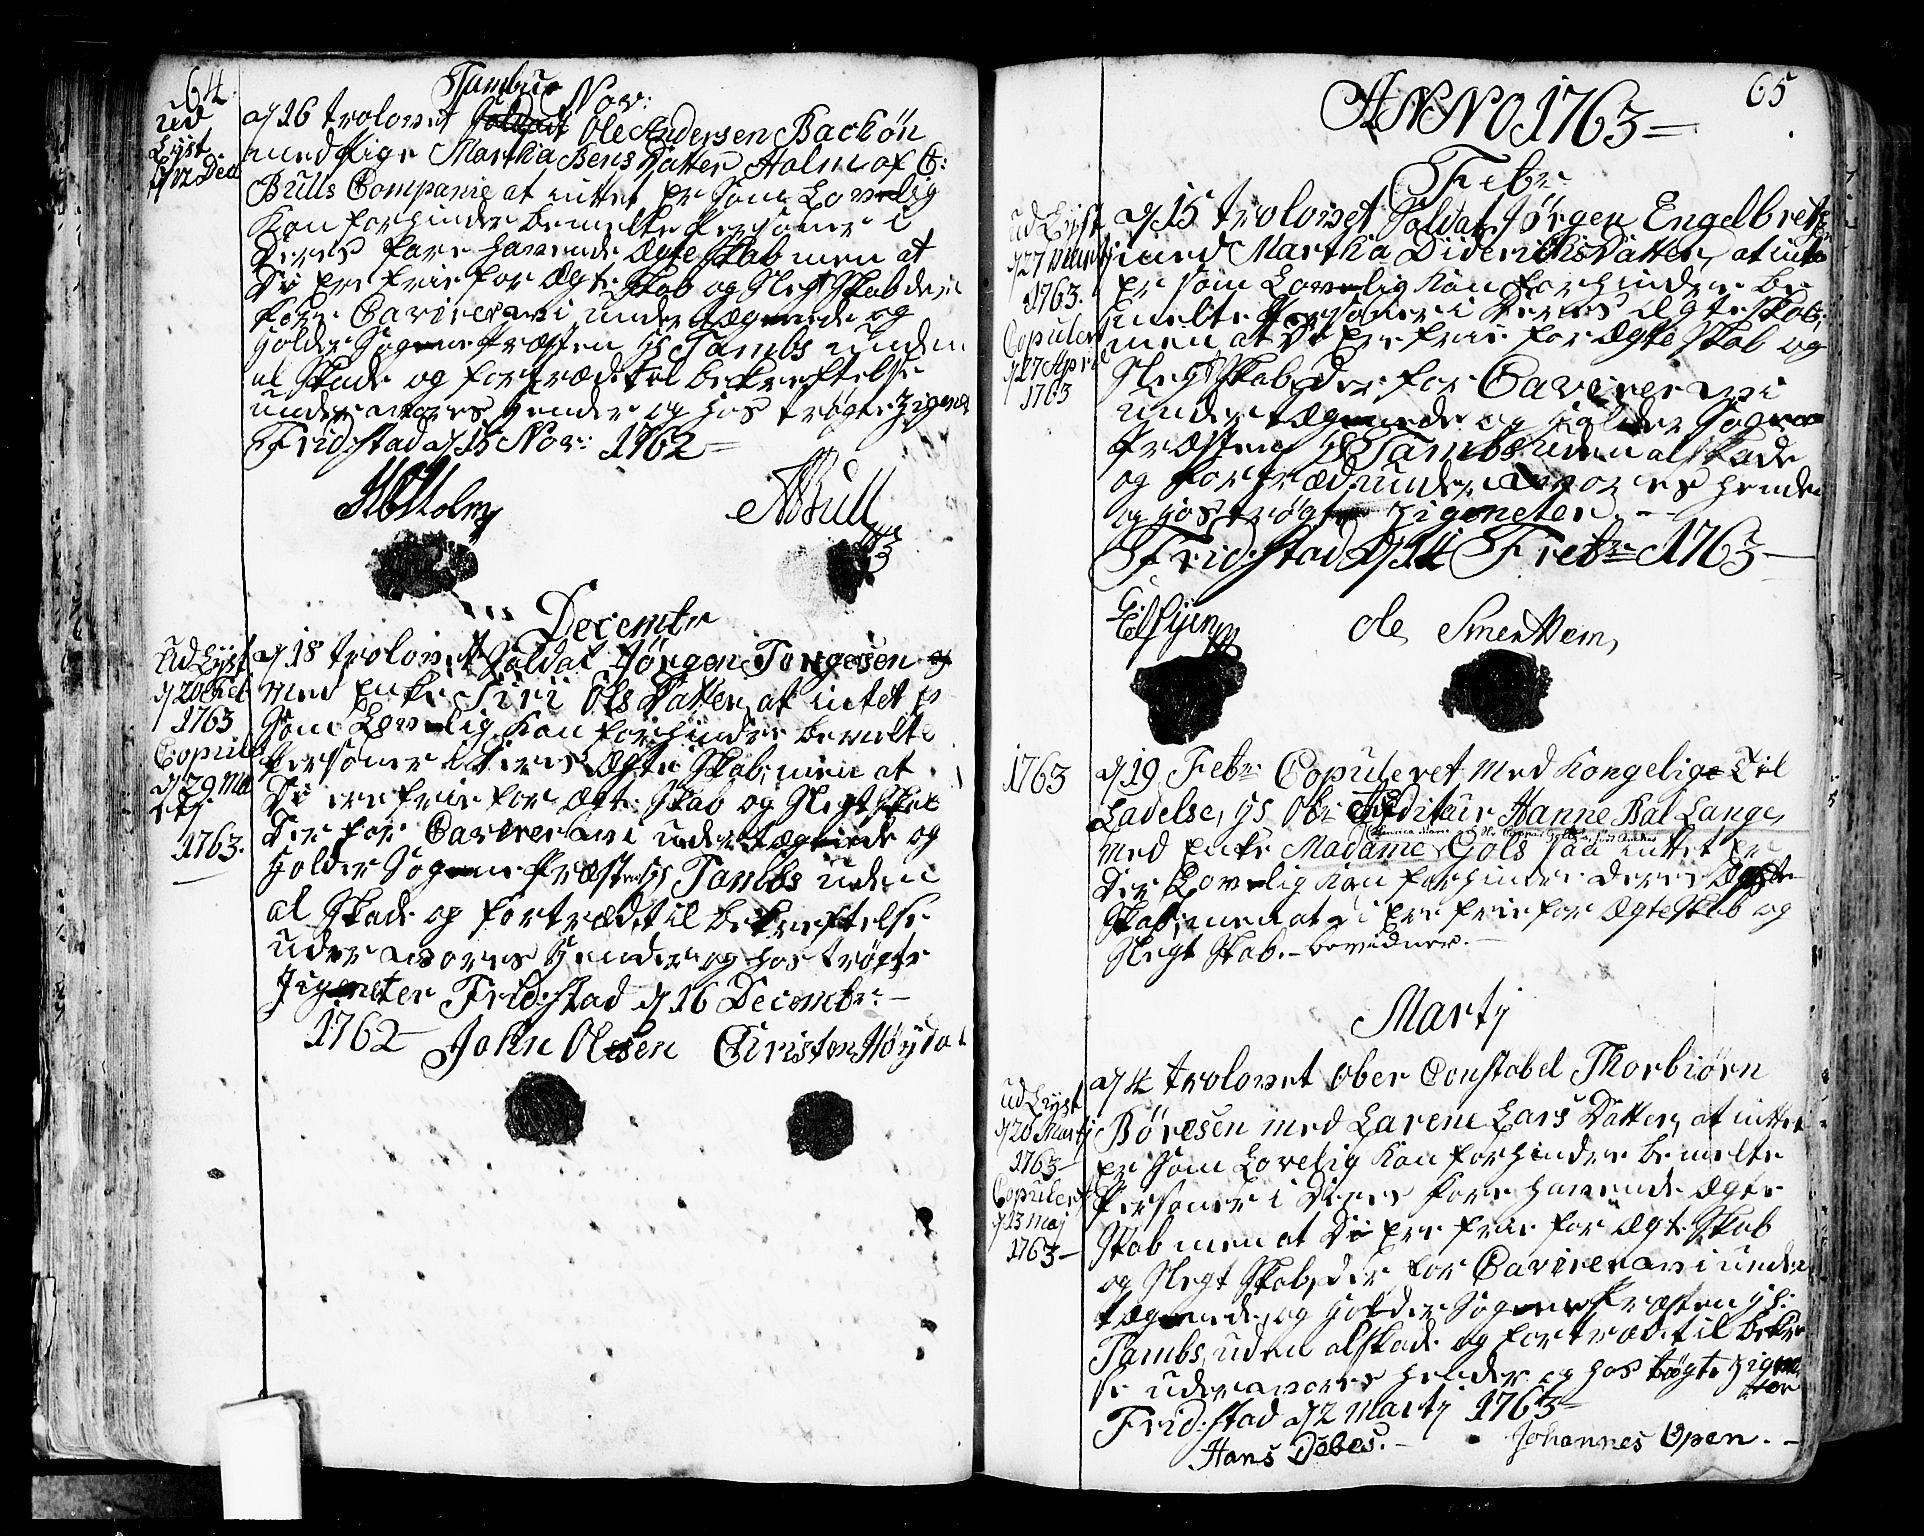 SAO, Fredrikstad prestekontor Kirkebøker, F/Fa/L0002: Ministerialbok nr. 2, 1750-1804, s. 64-65